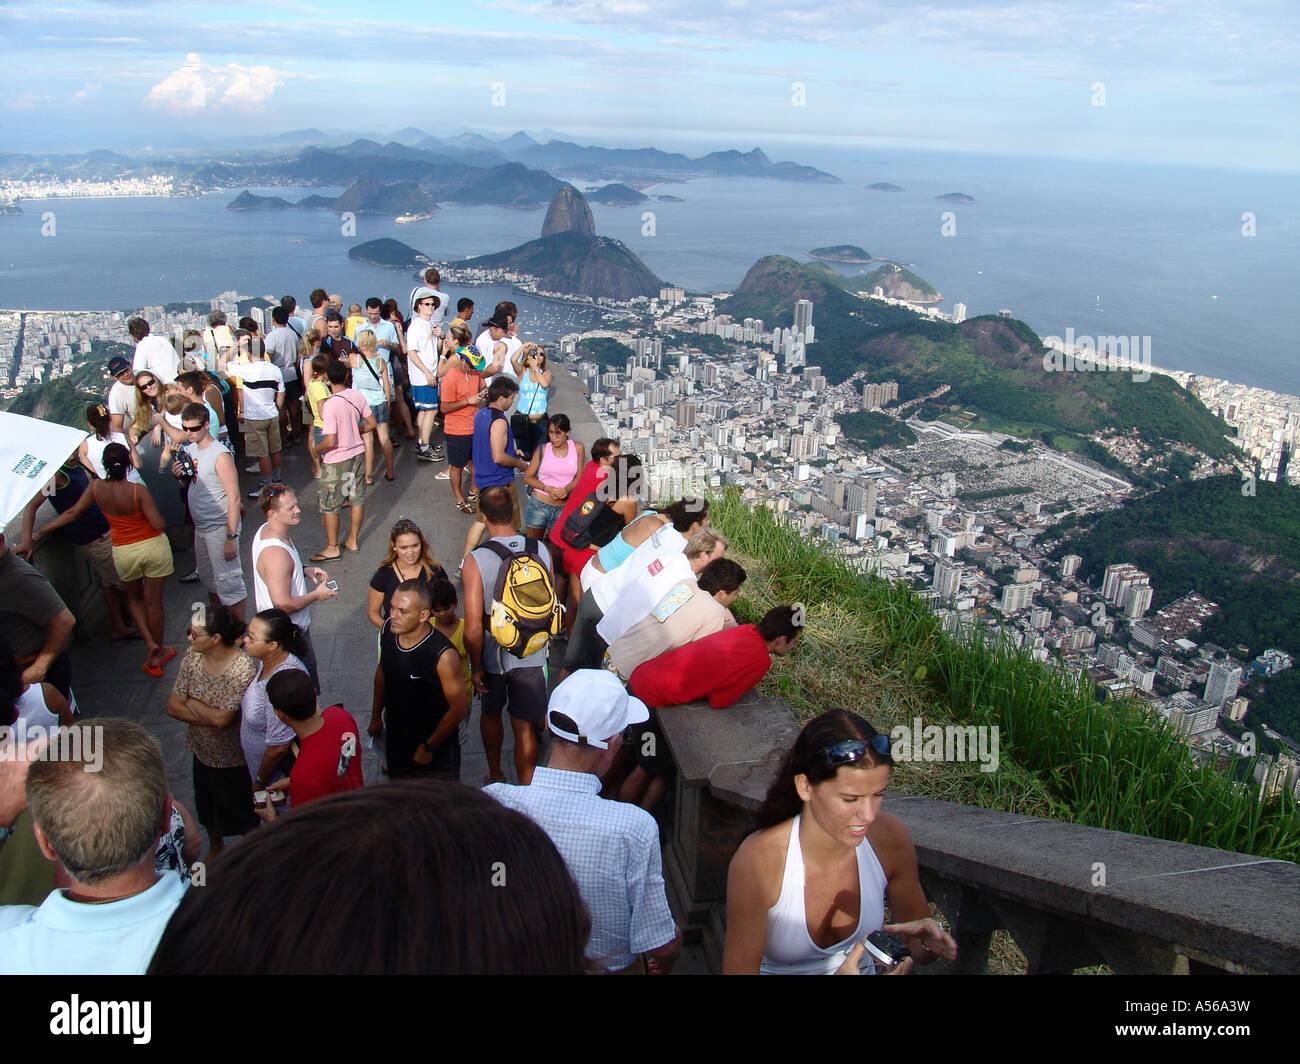 Painet iy8156 brazil tourists enjoying panorama rio janeiro corcovado peak site statue christ redeemer 2005 country Stock Photo